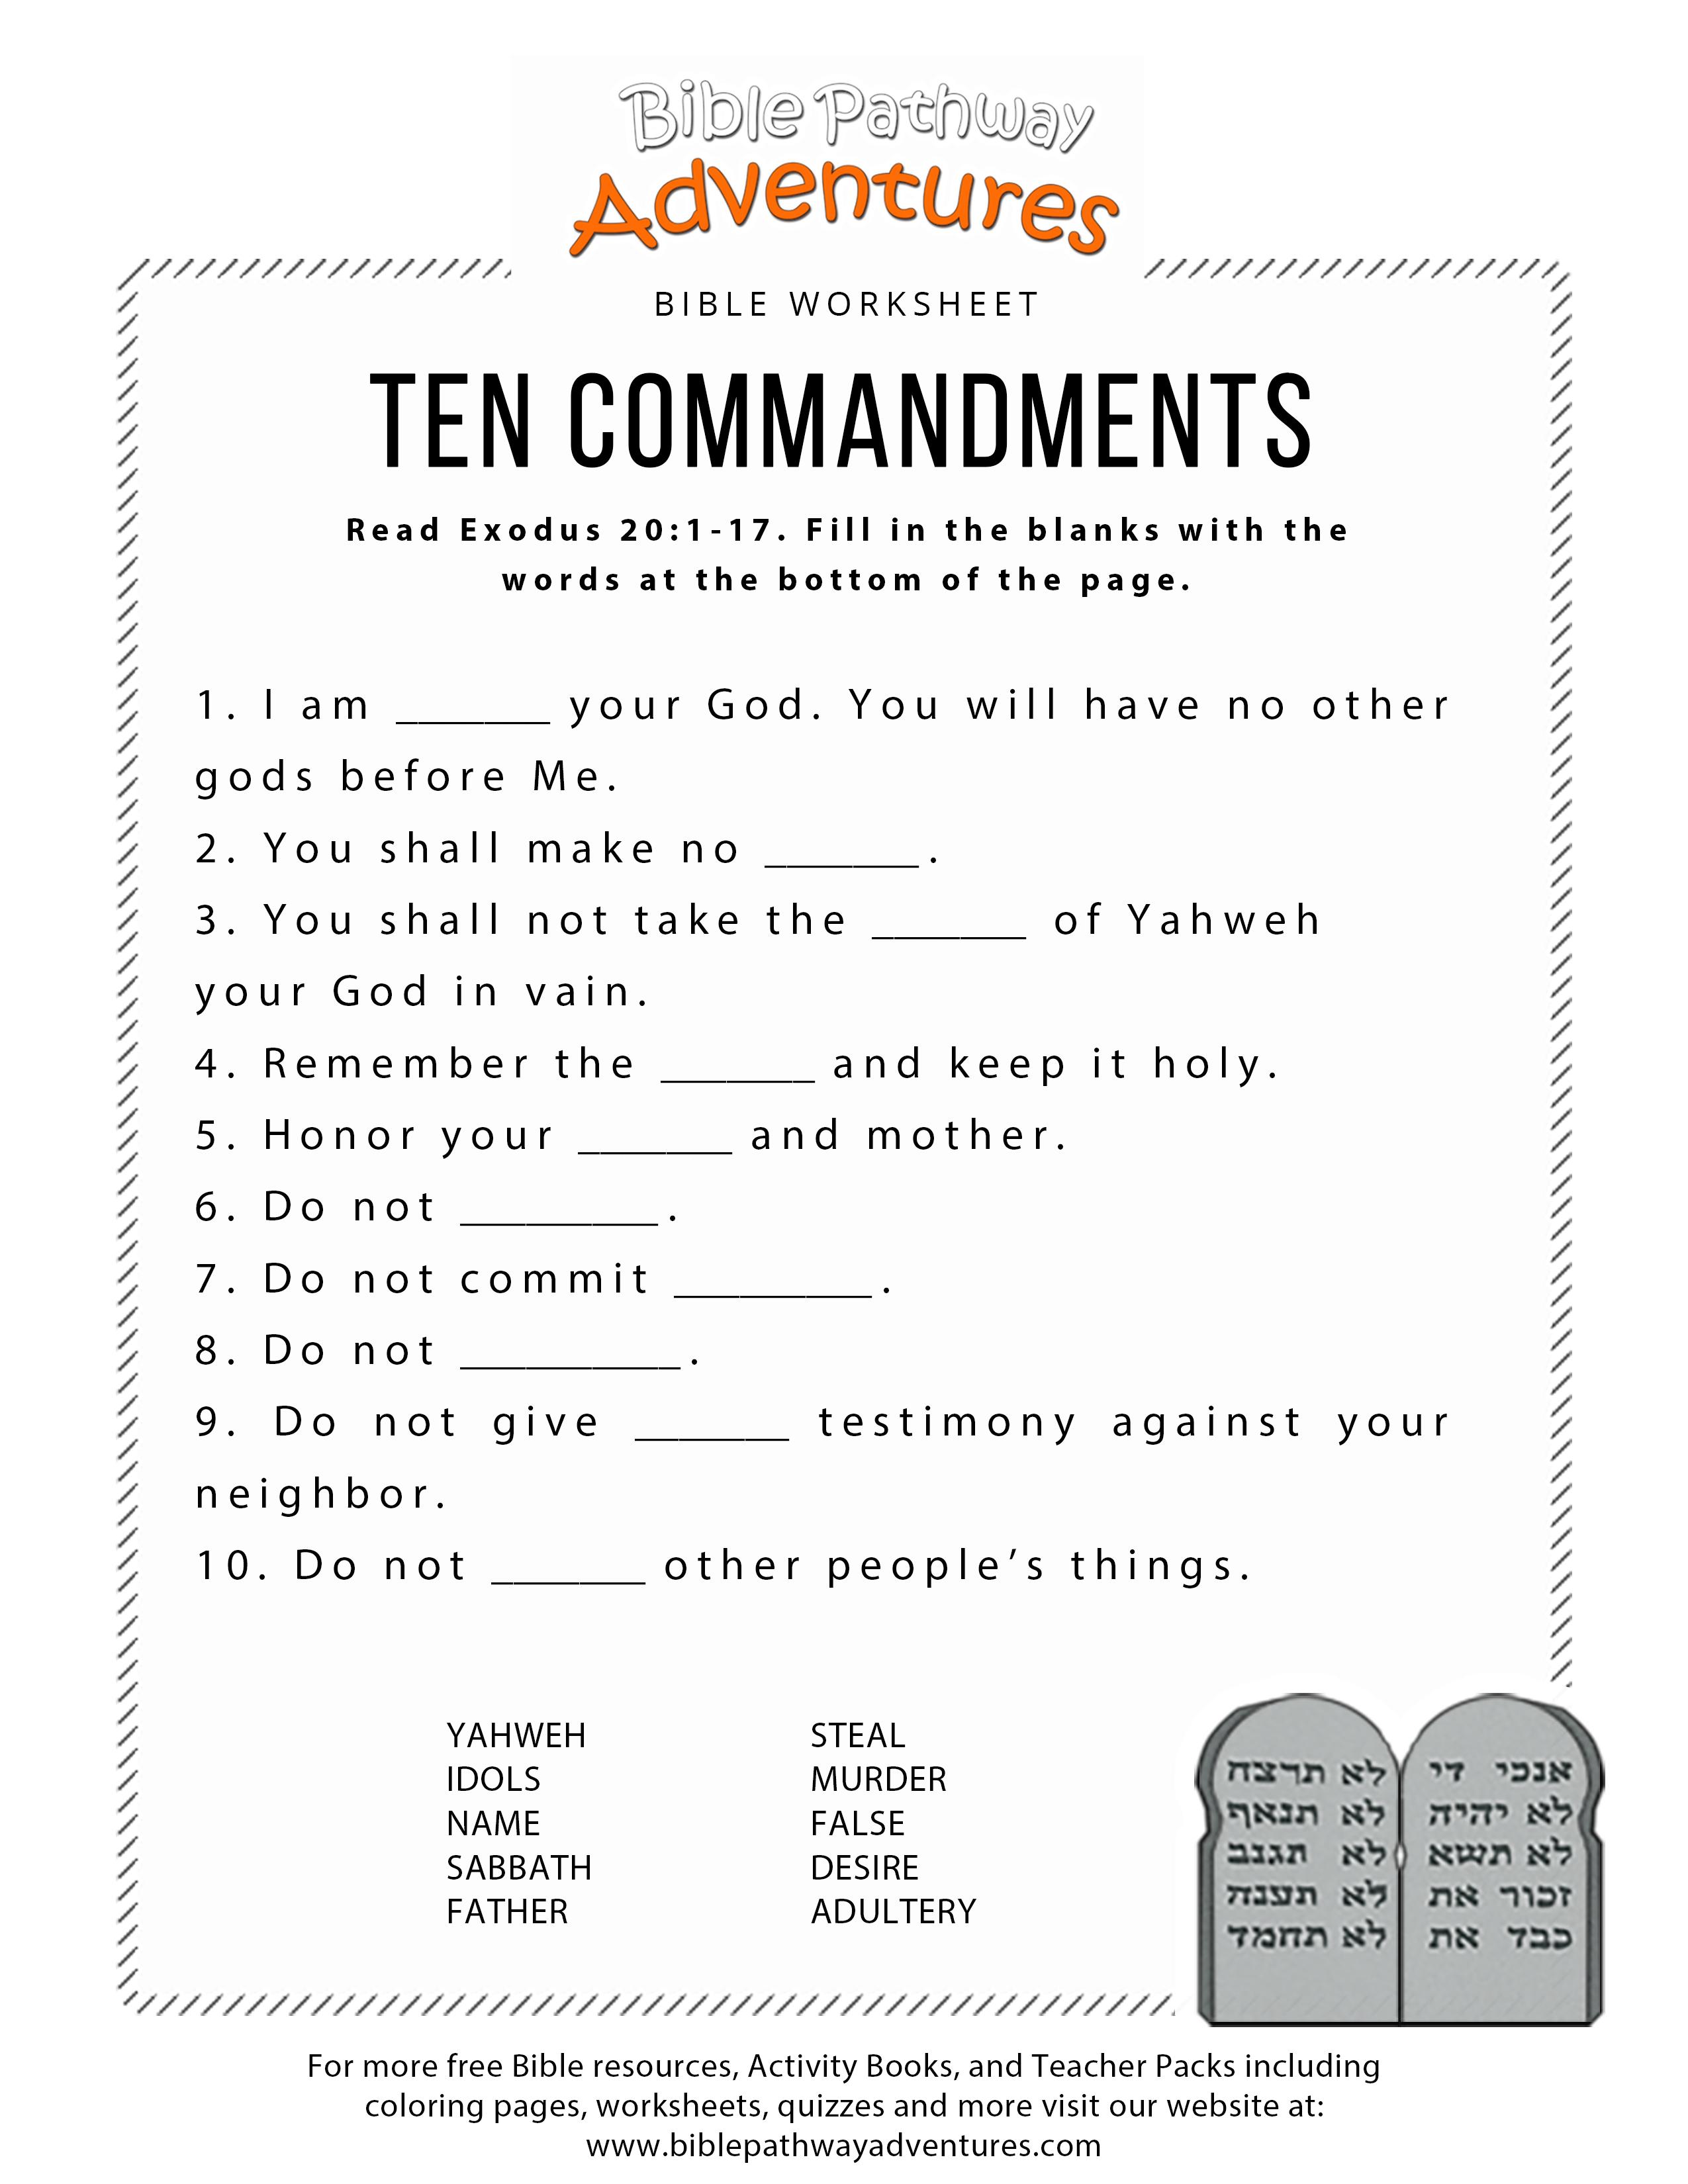 Ten Commandments Worksheet For Kids | Worksheets For Psr | Bible - Free Printable Bible Games For Kids